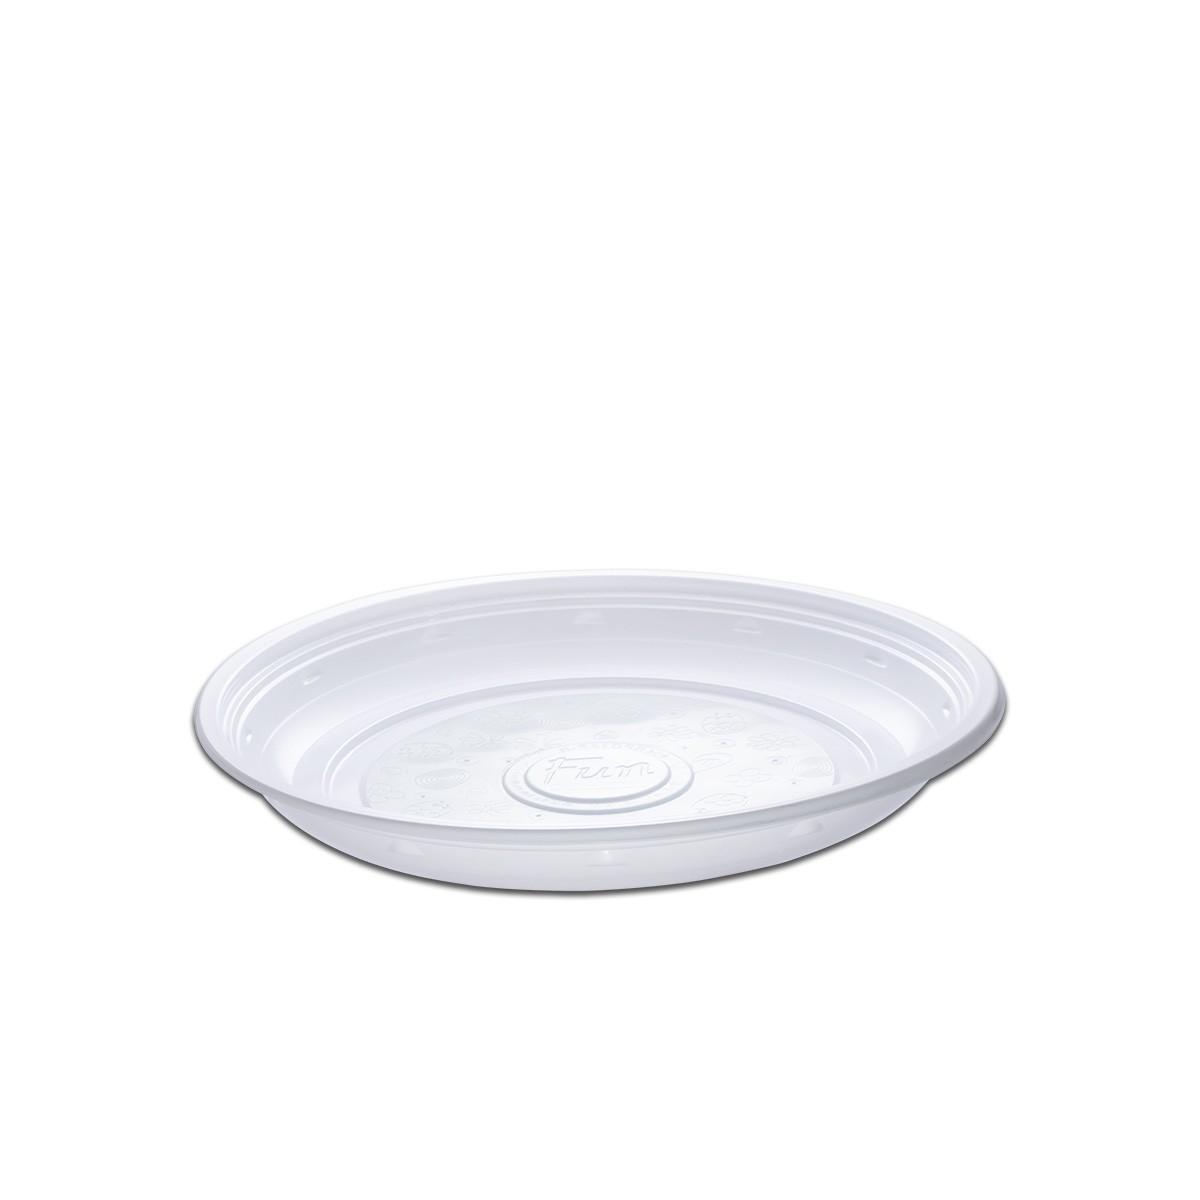 Roundpac Round Plate ⌀22cm - PP/White Deluxe   25pcsx10pkts